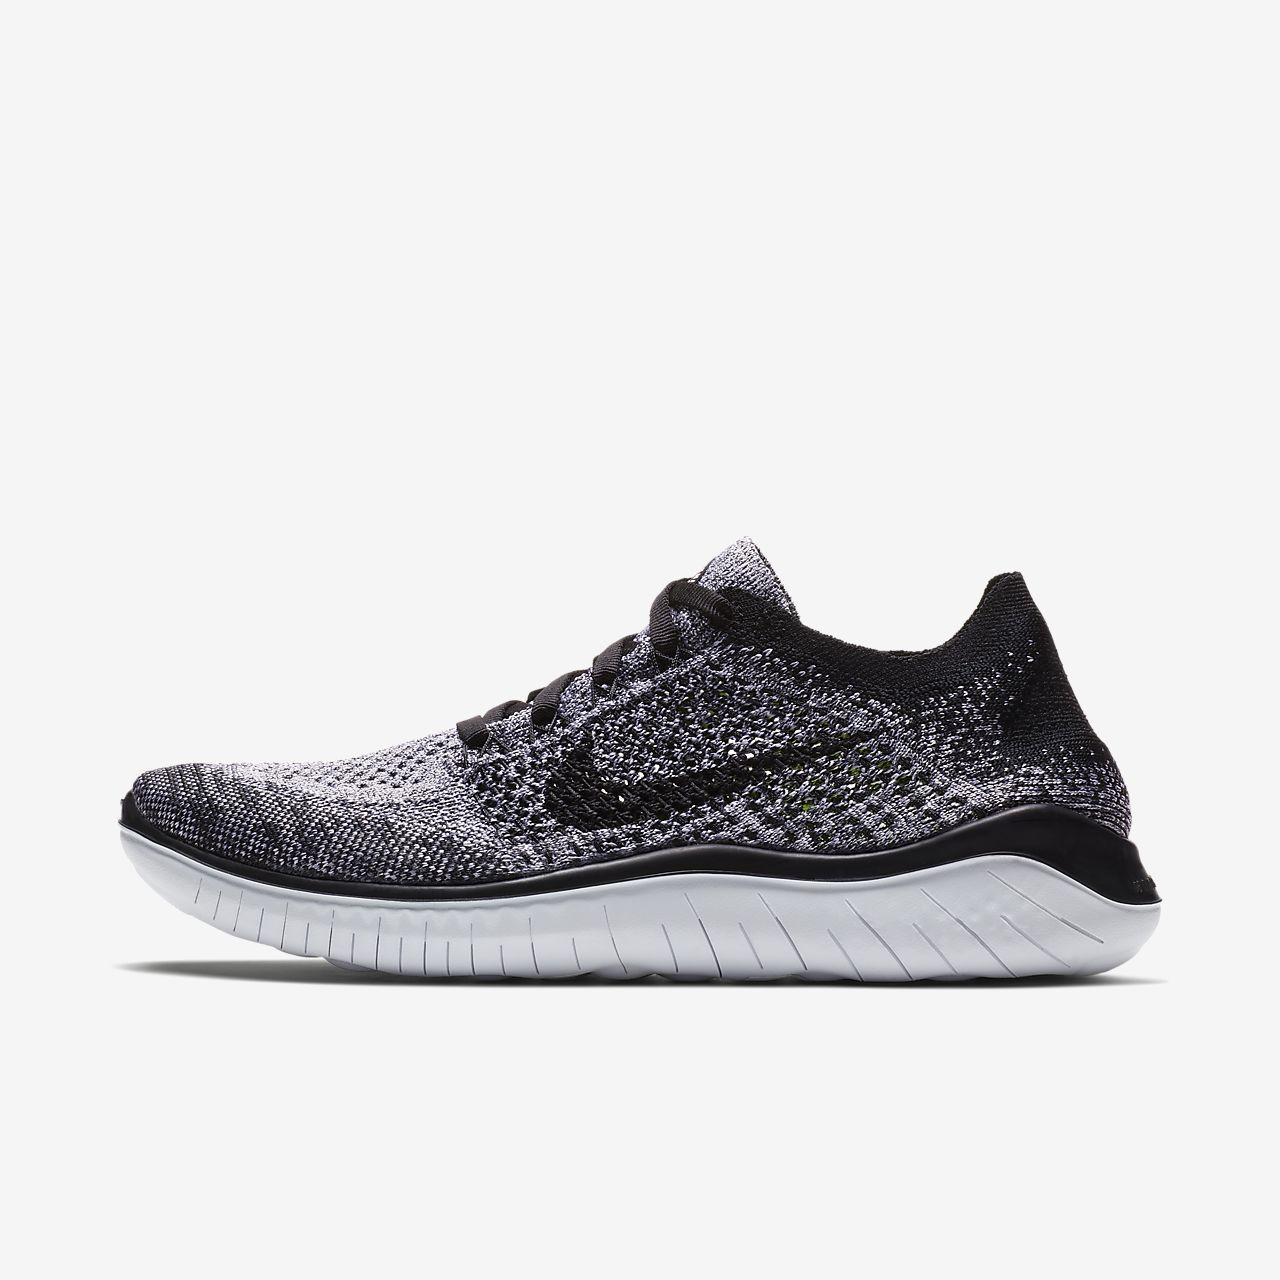 designer fashion 35ca2 4780e Nike Free RN Flyknit 2018 Women's Running Shoe